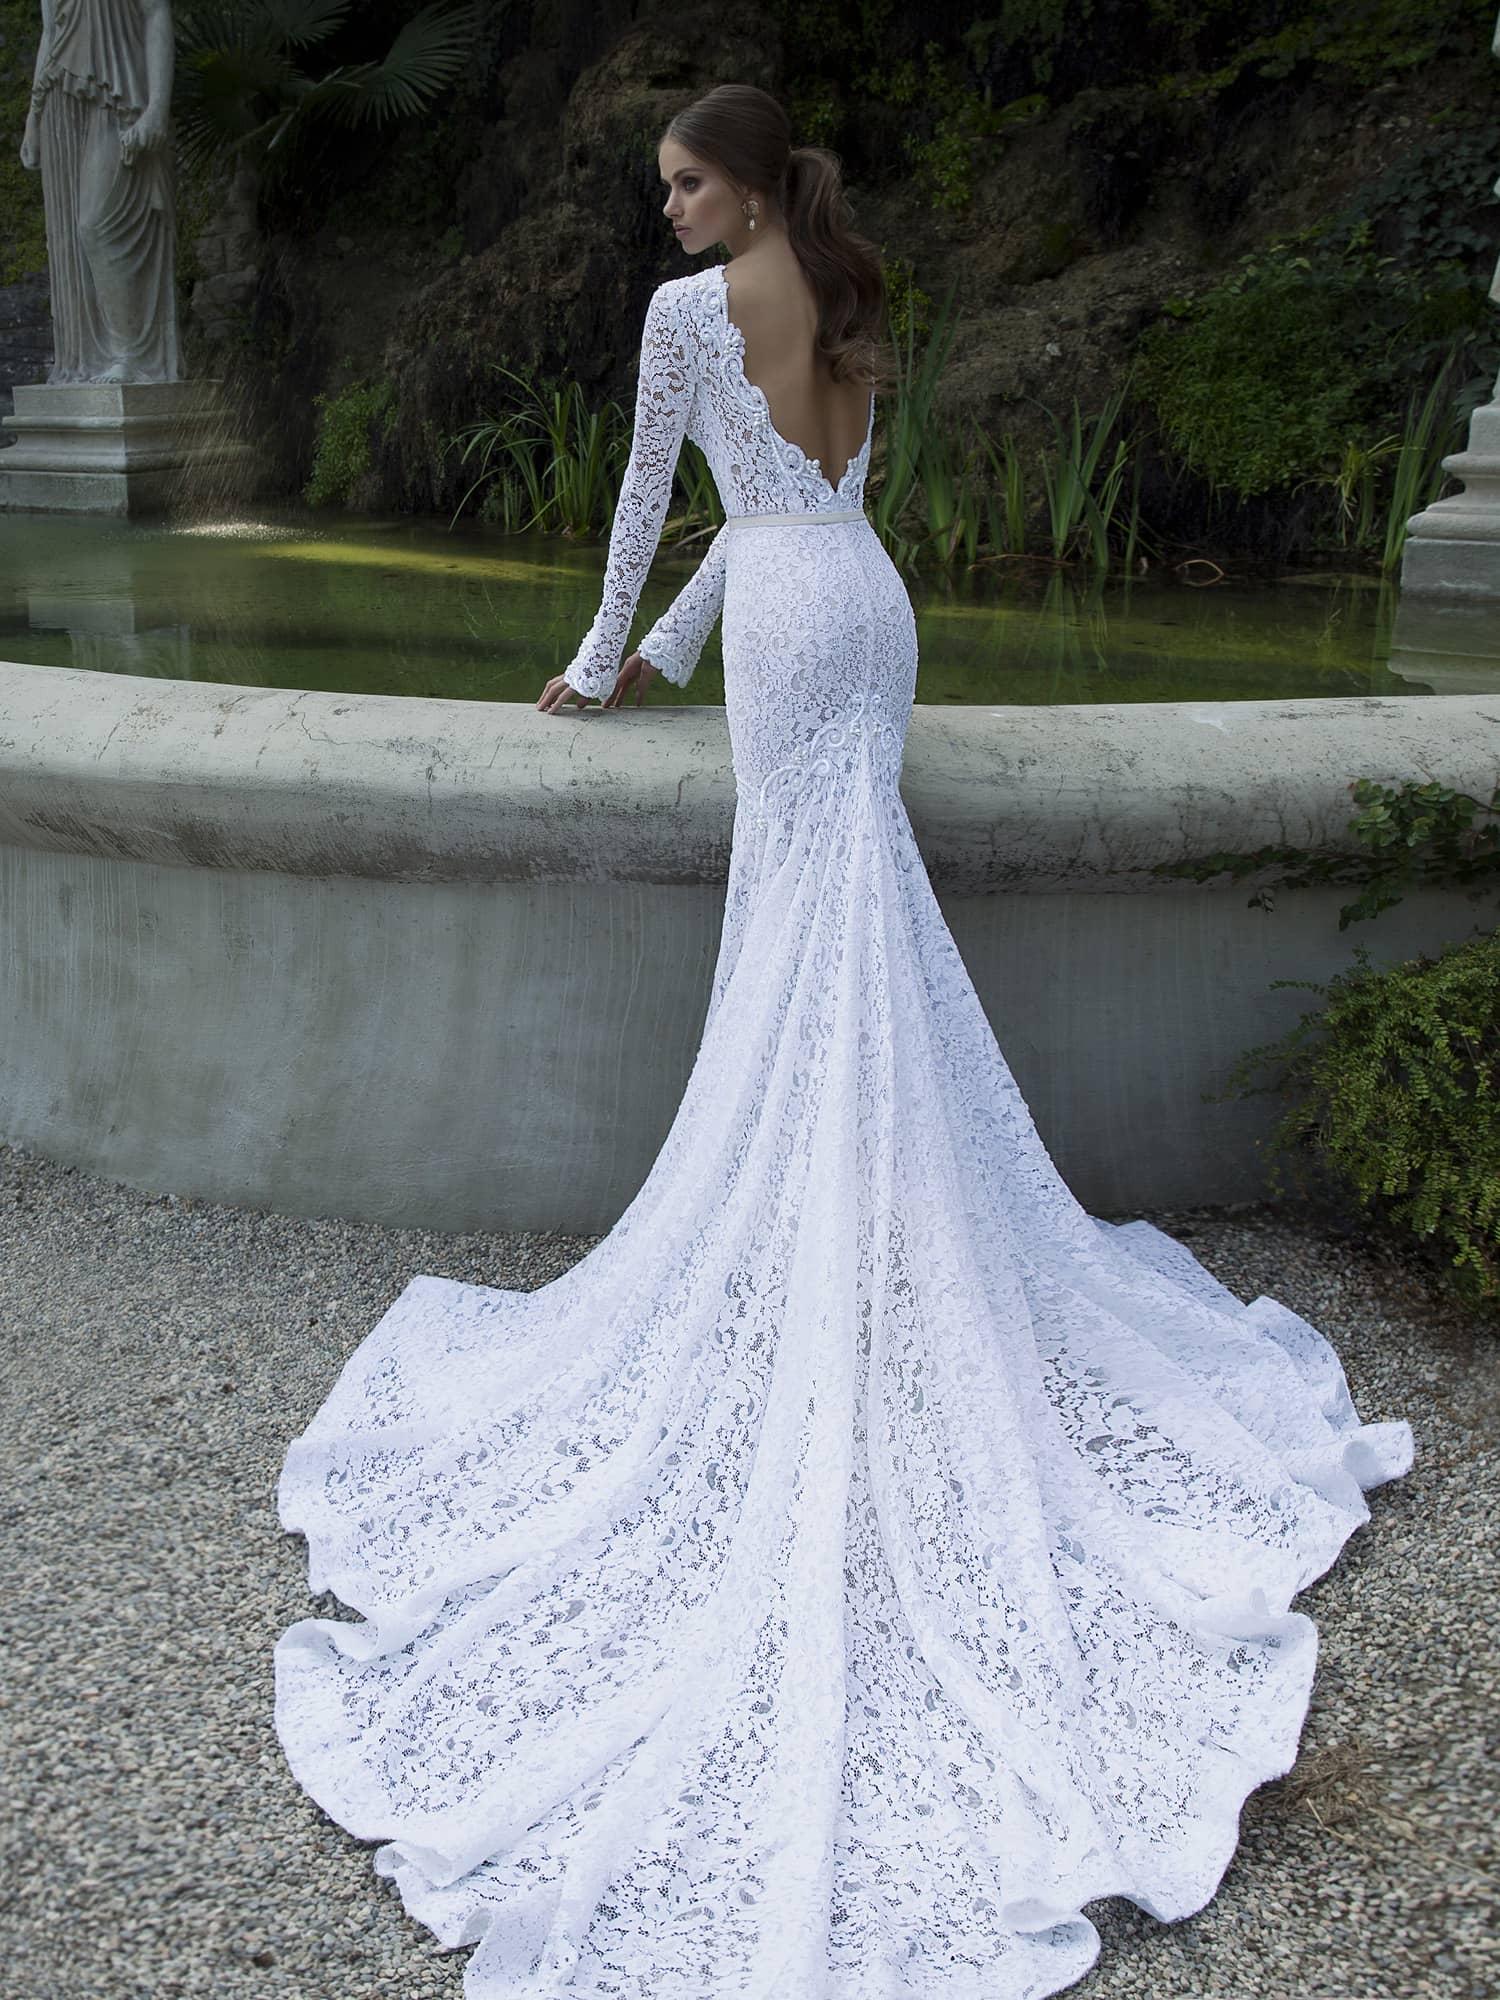 Amber vito wedding